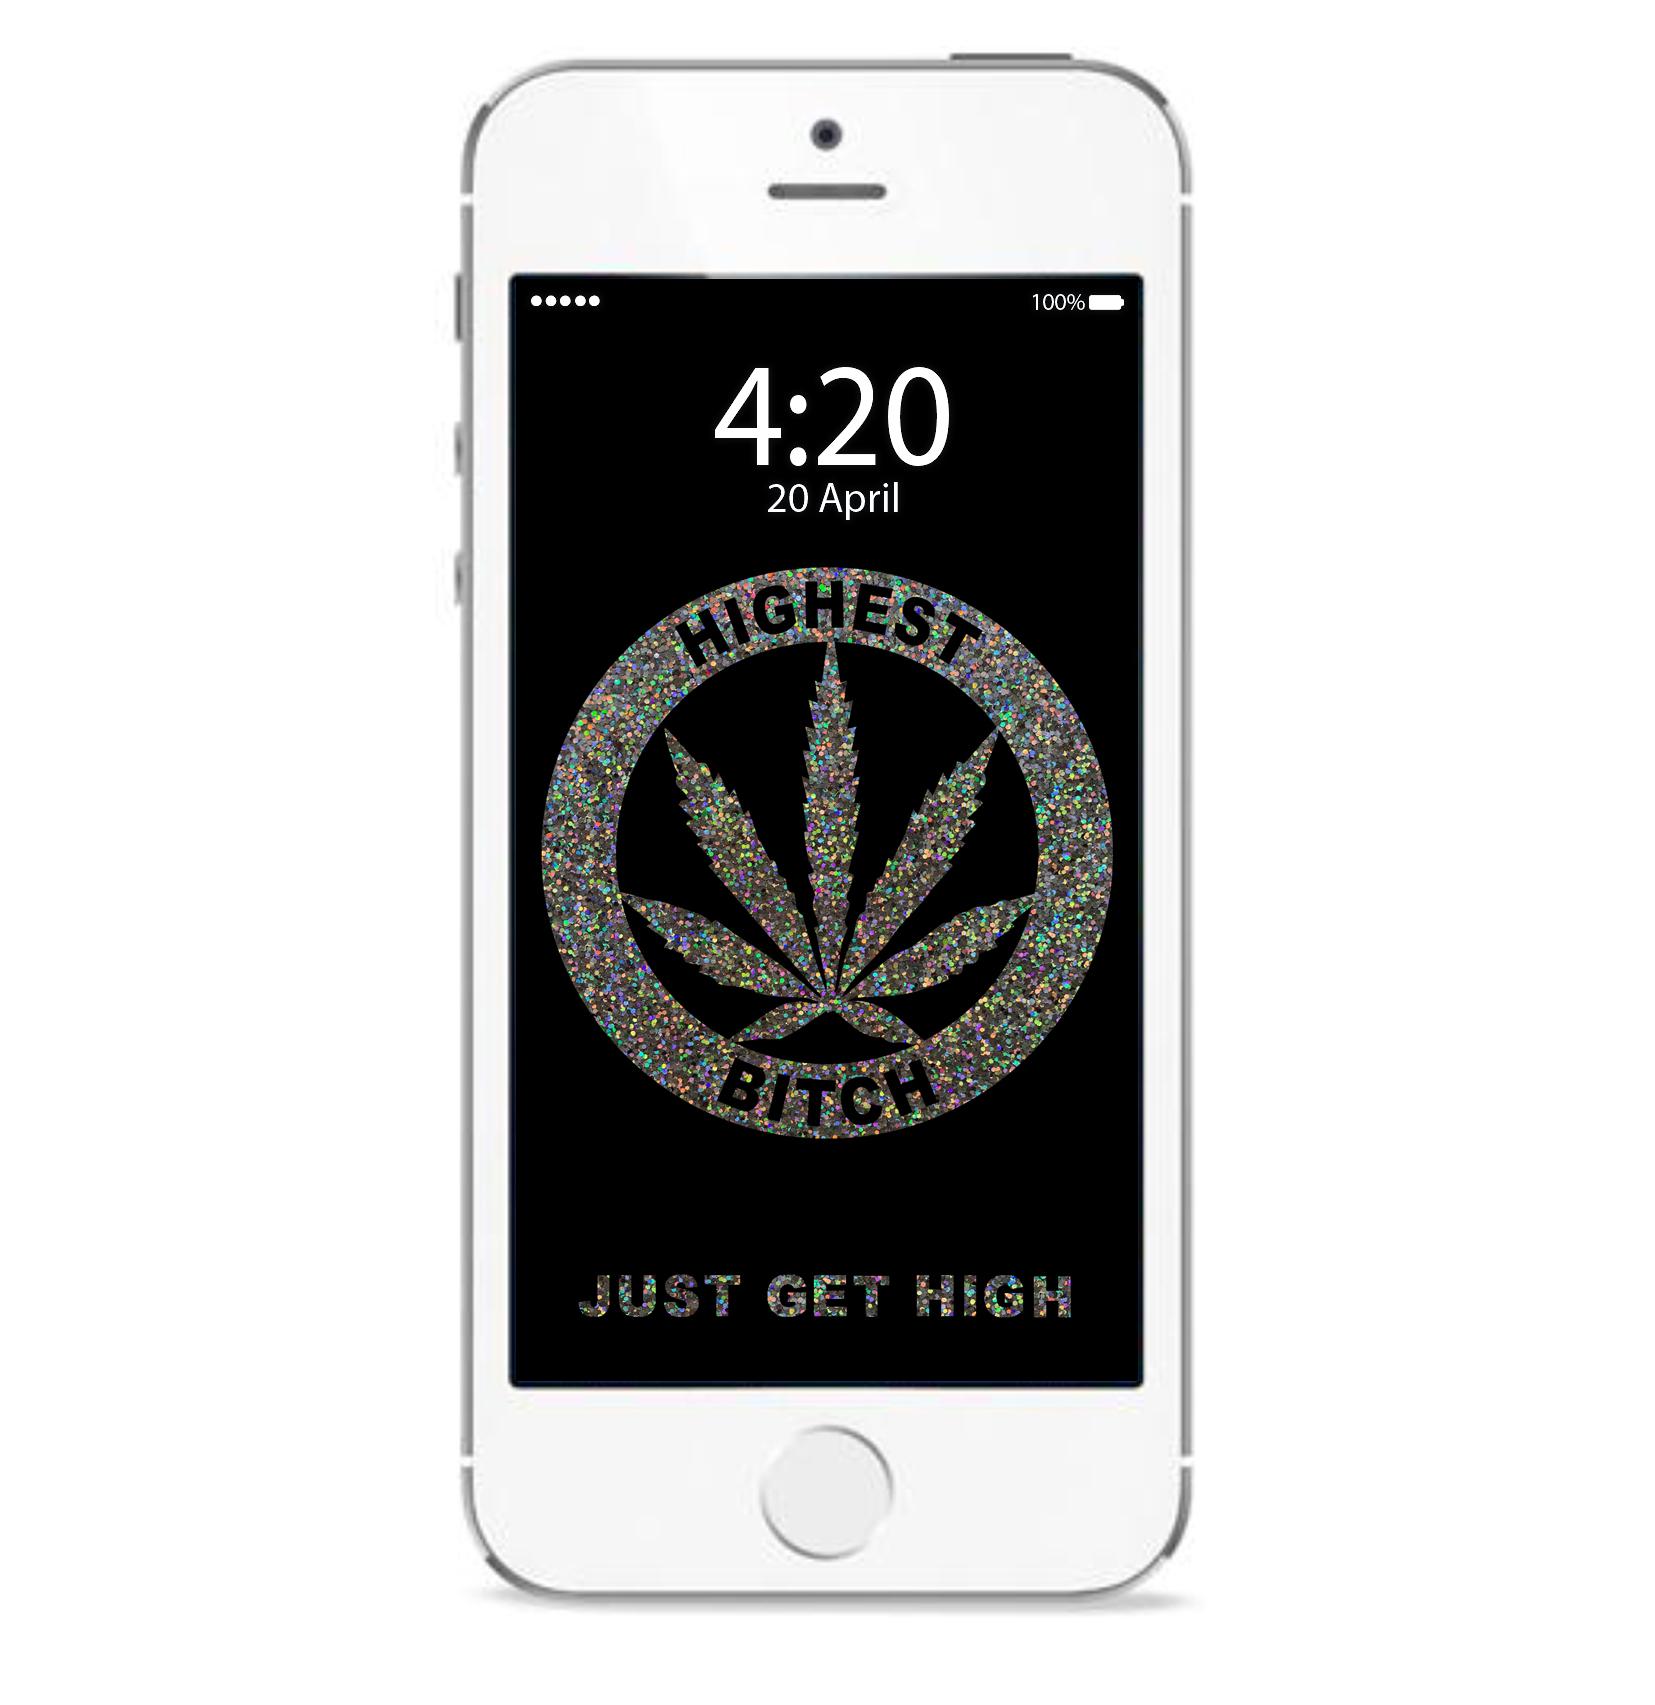 just get high_iphone_highest bitch glitter_mockup